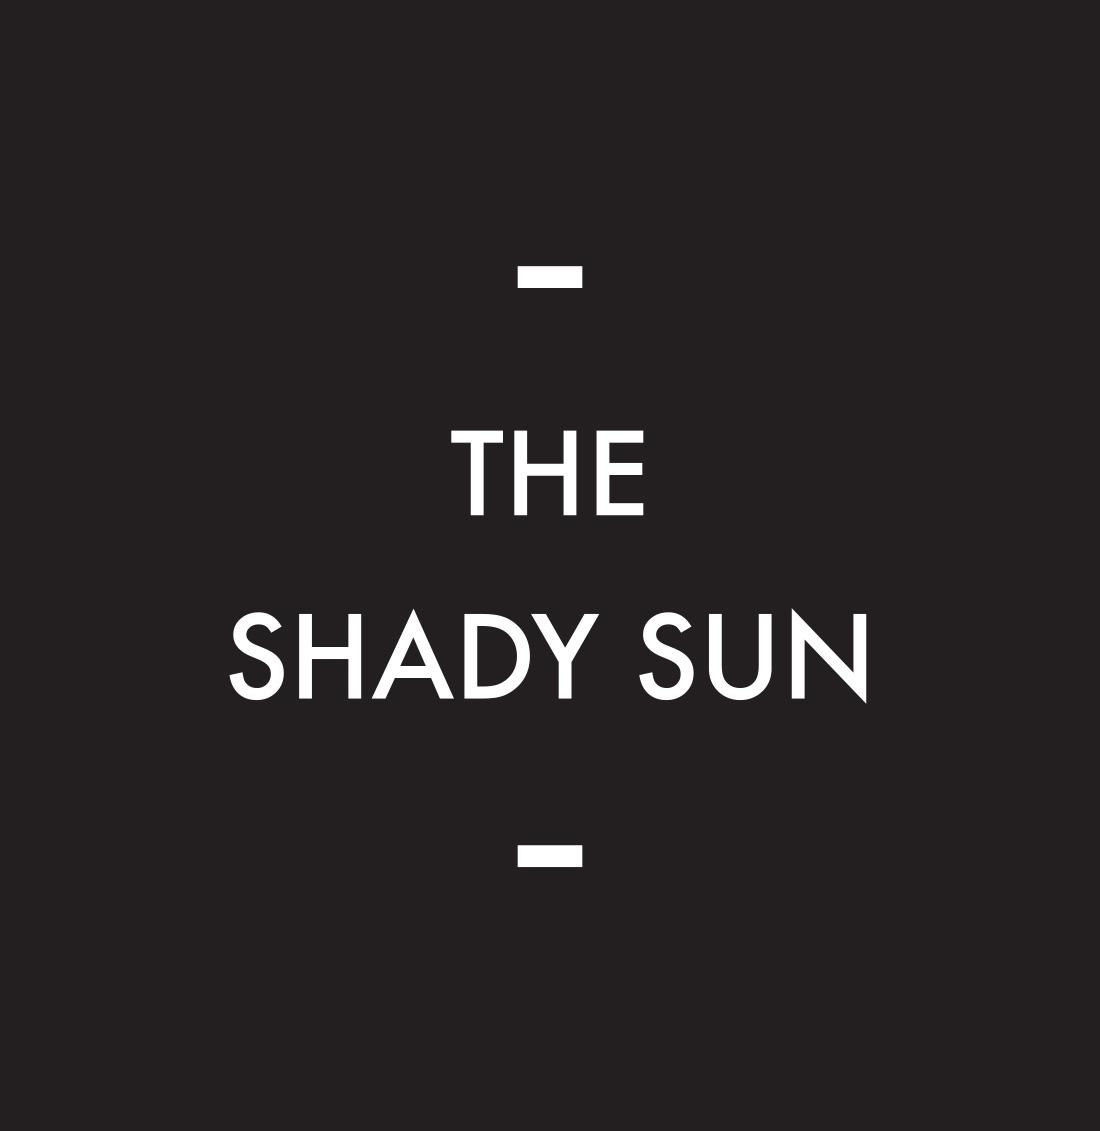 The-Shady-Sun-LOGO